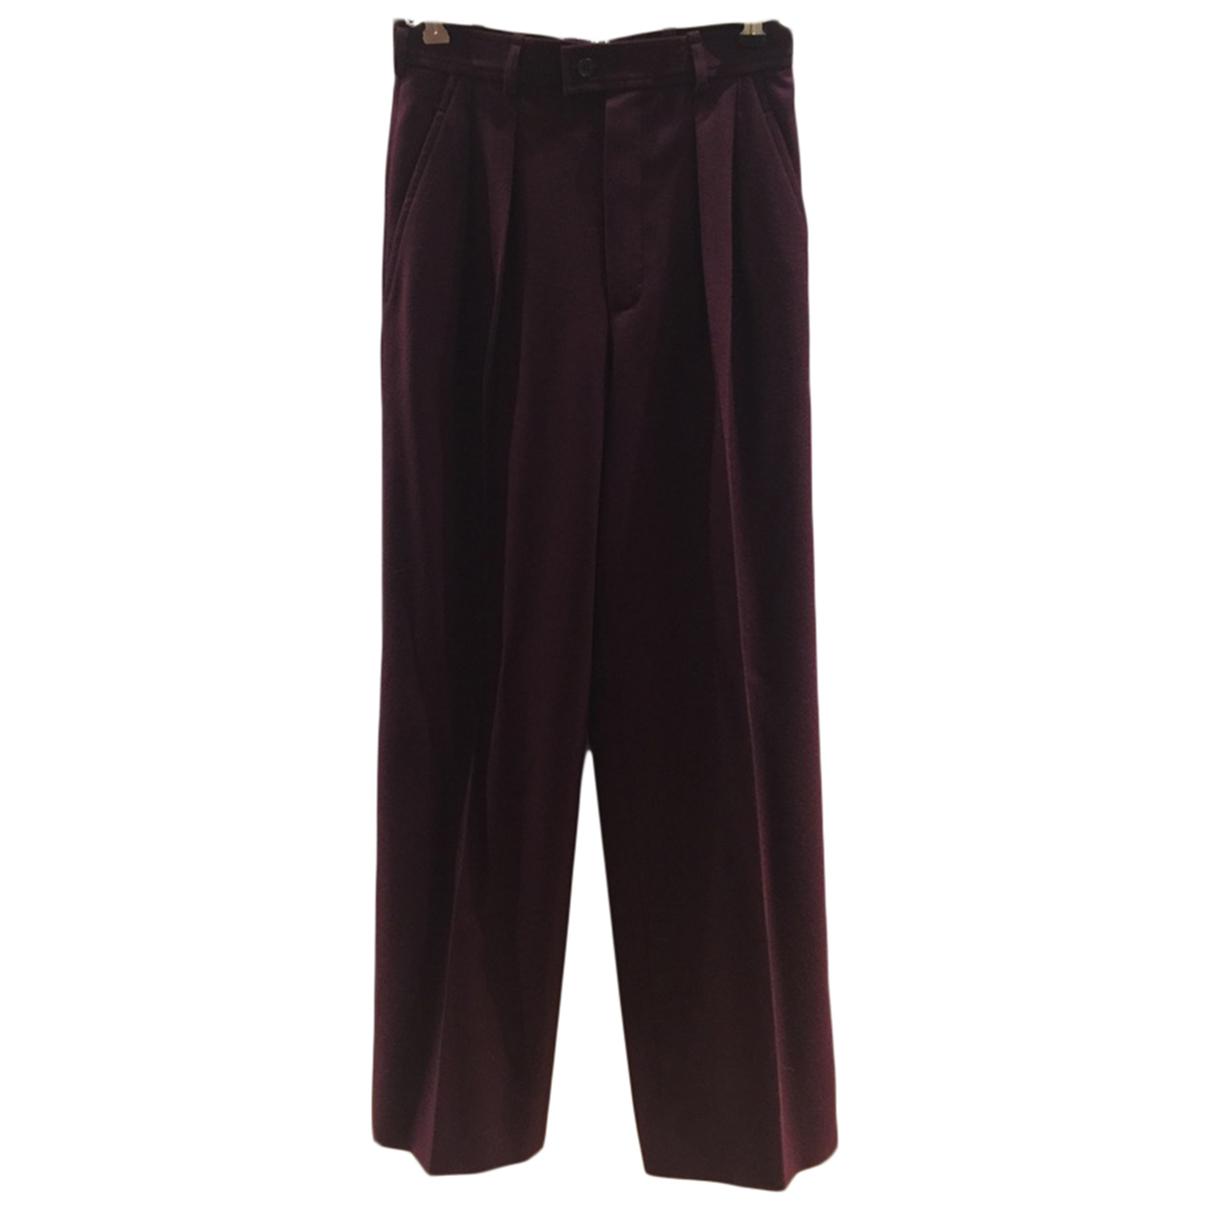 Yves Saint Laurent N Purple Wool Trousers for Women 34 FR